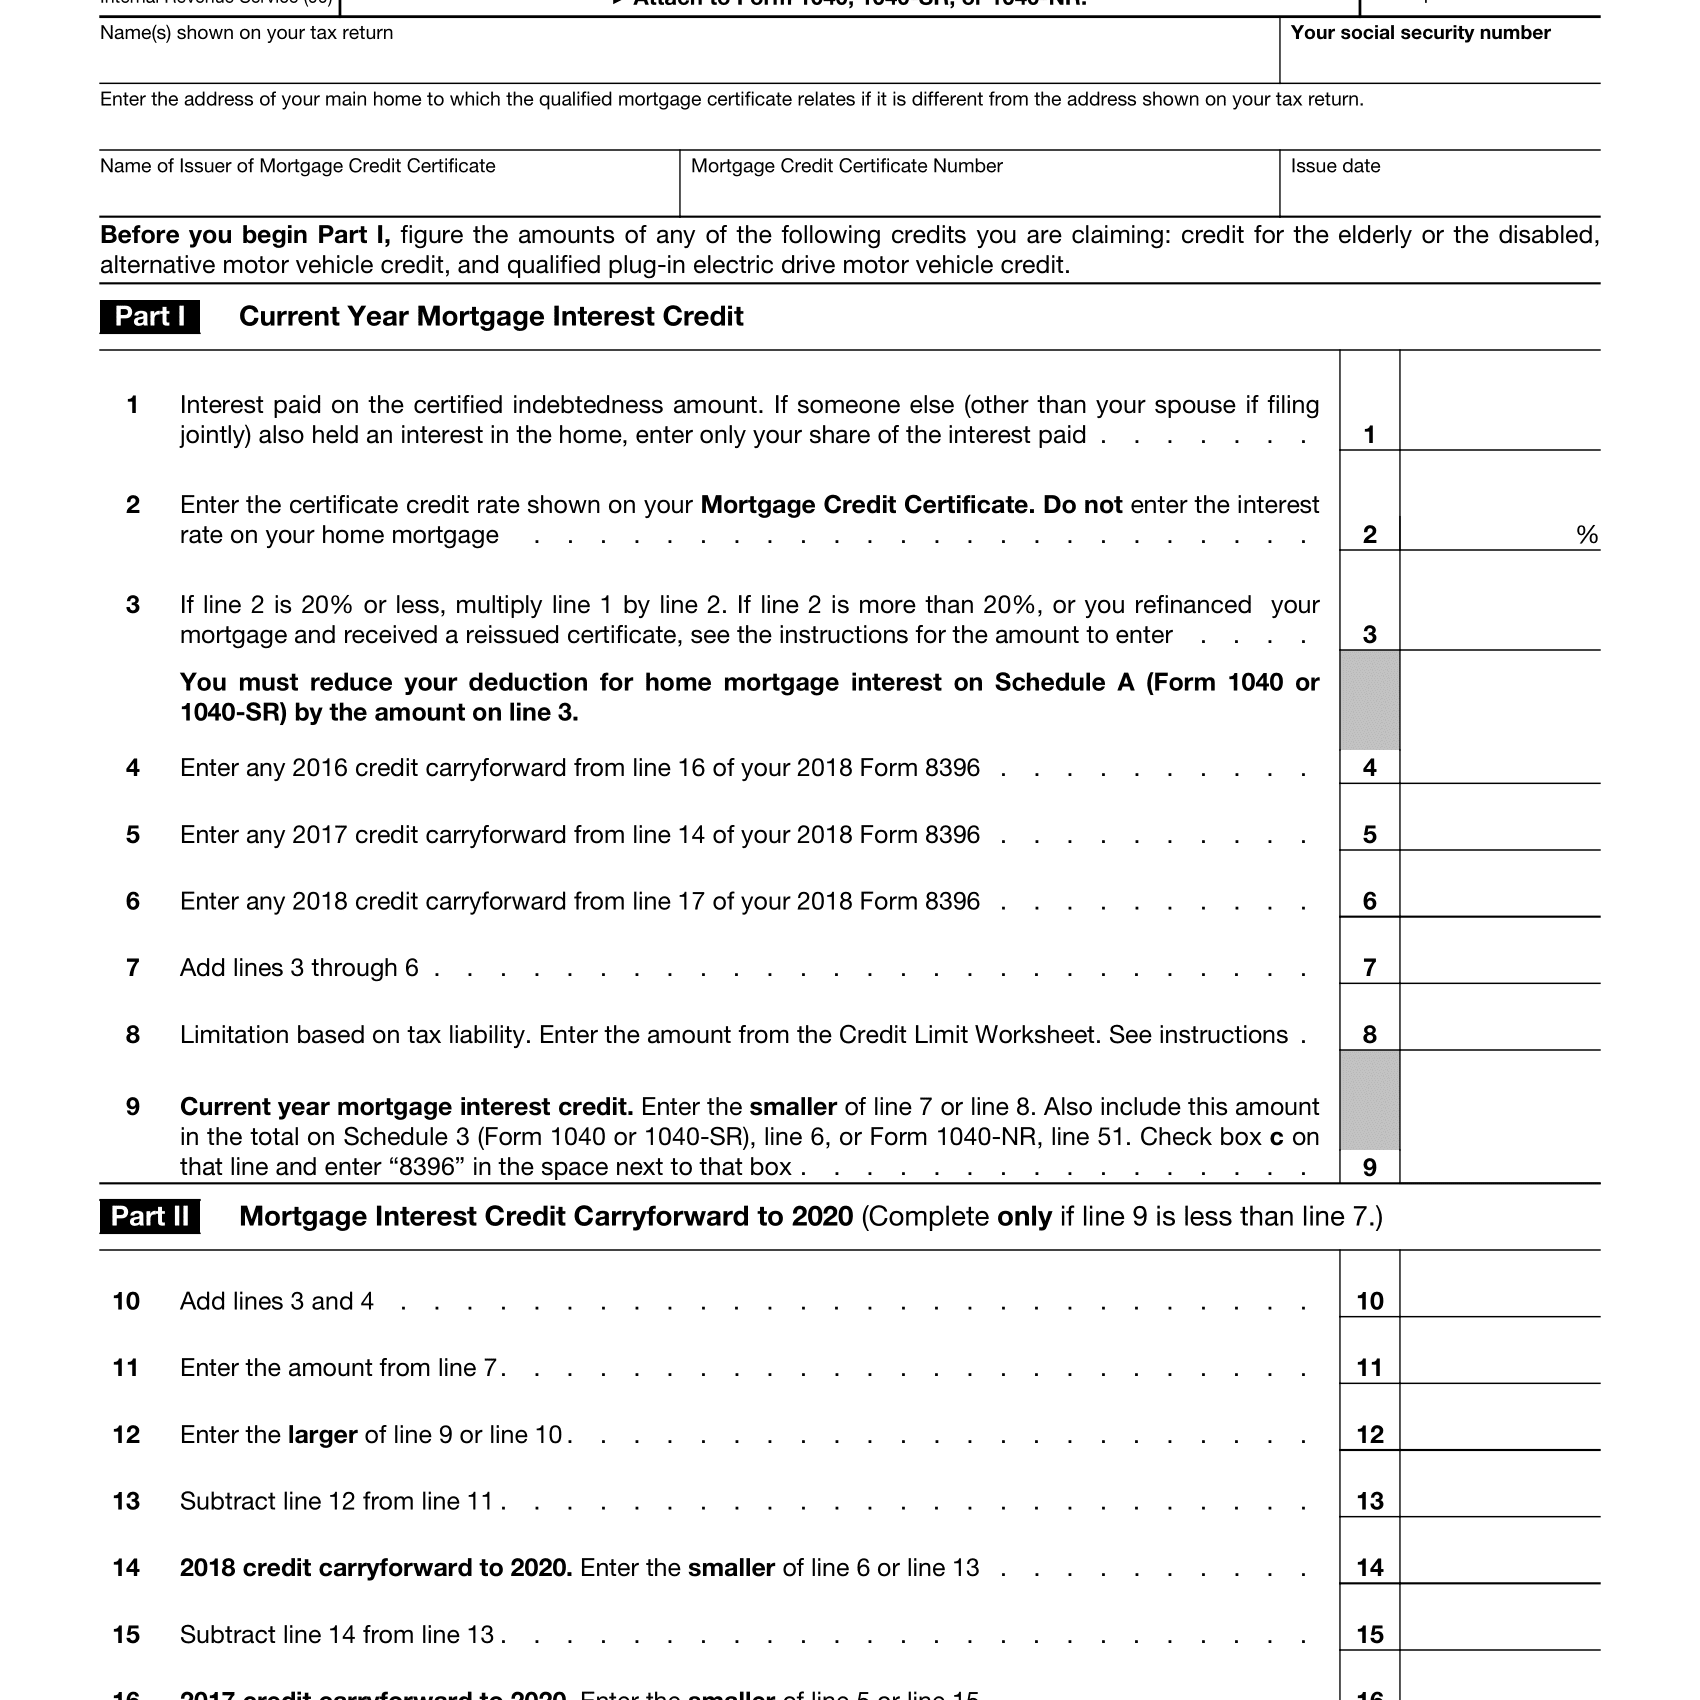 Form 8396 Mortgage Interest Credit Definition